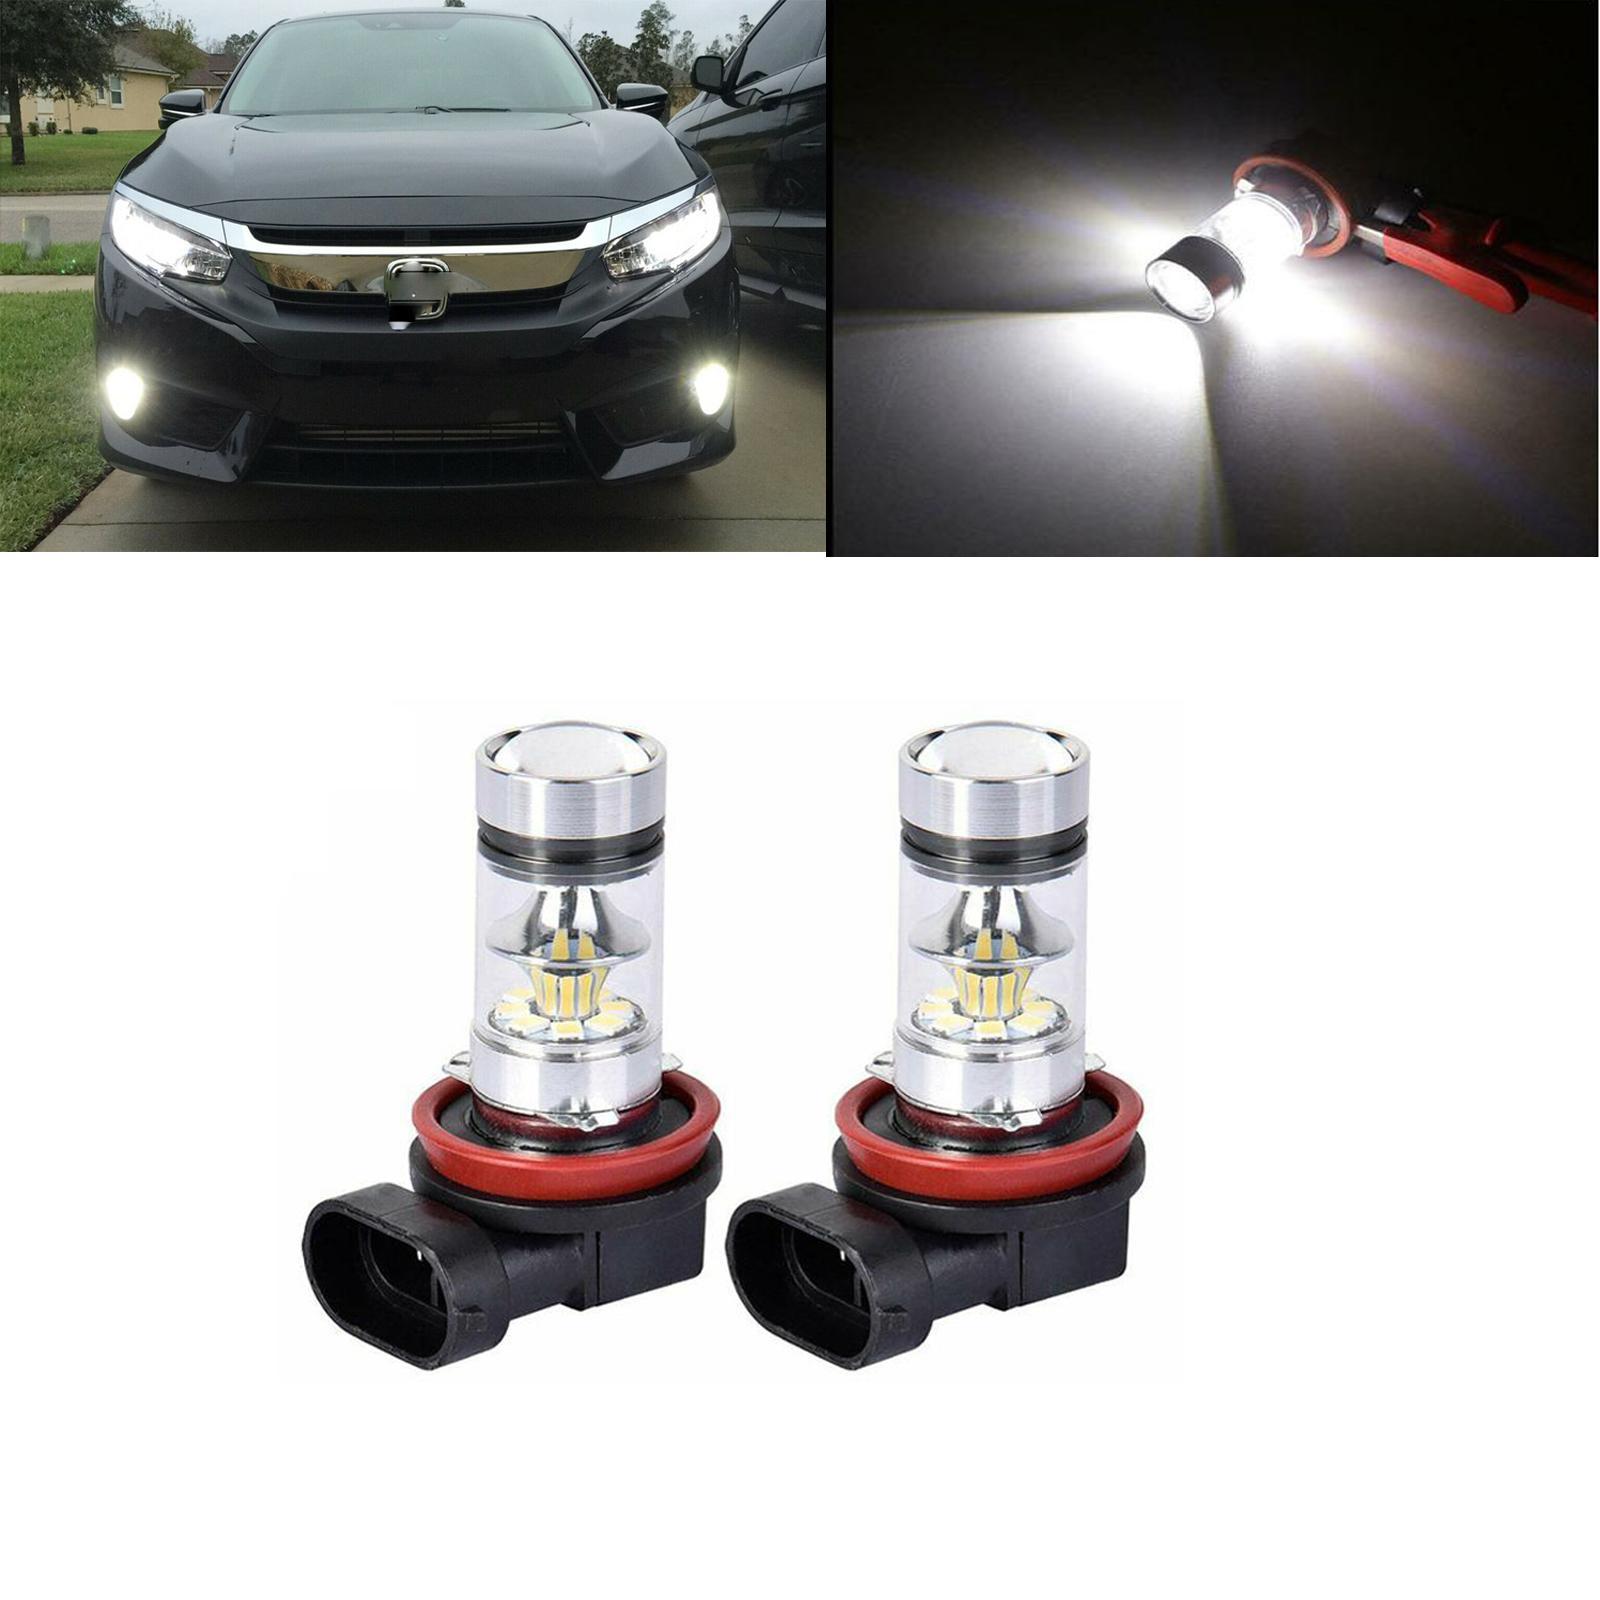 2X H8 H11 Nebel Licht Projektor Objektiv Weiß Led-lampen Für Honda Accord Civic 2006-2016 2017 2018 2019